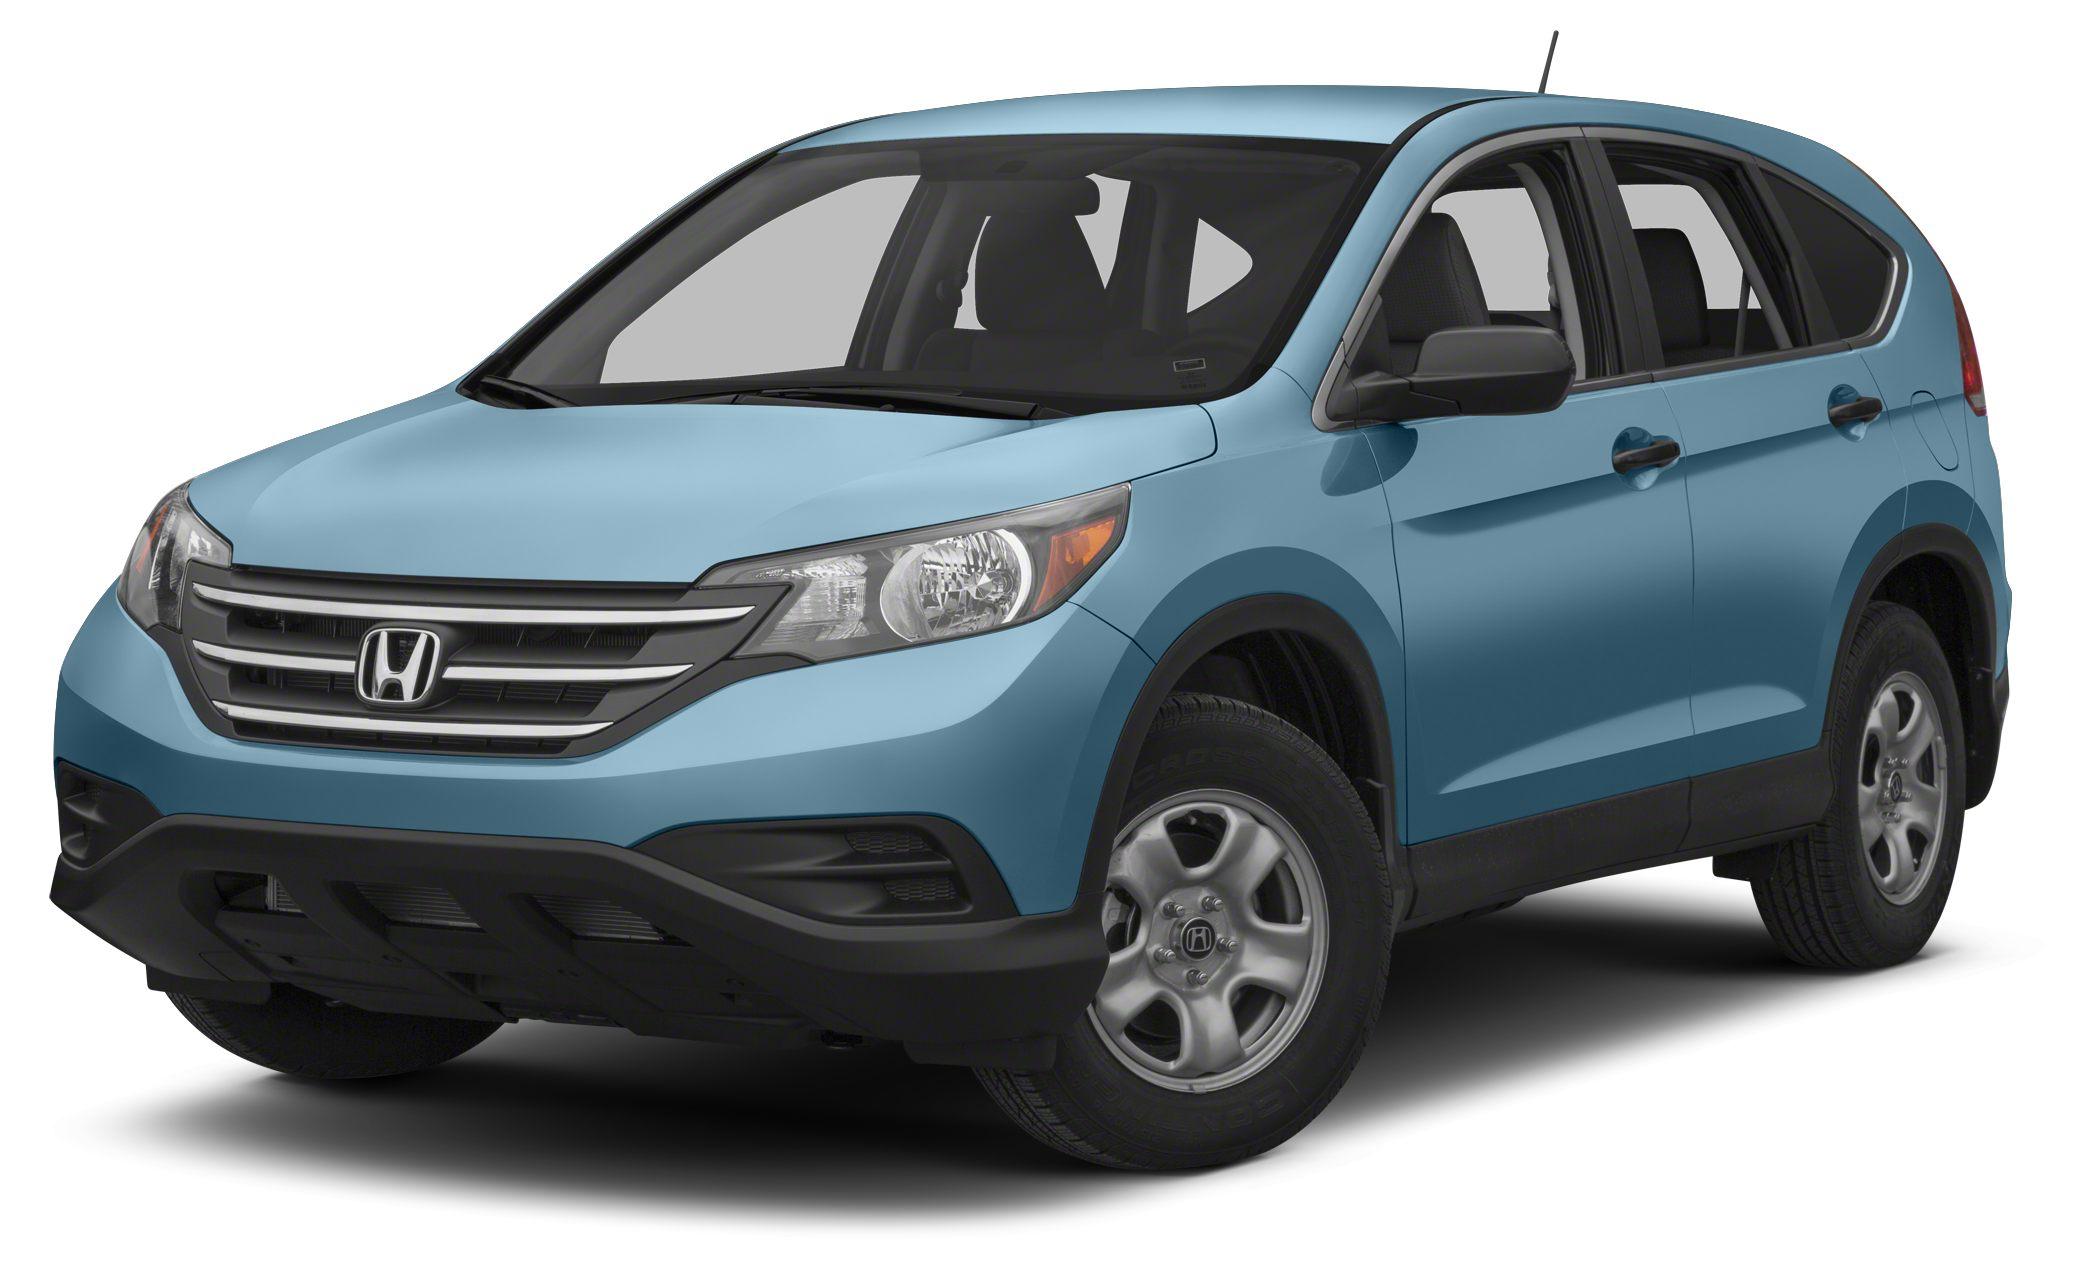 2013 Honda CR-V LX PRICED TO MOVE 1100 below Kelley Blue Book EPA 30 MPG Hwy22 MPG City LX t